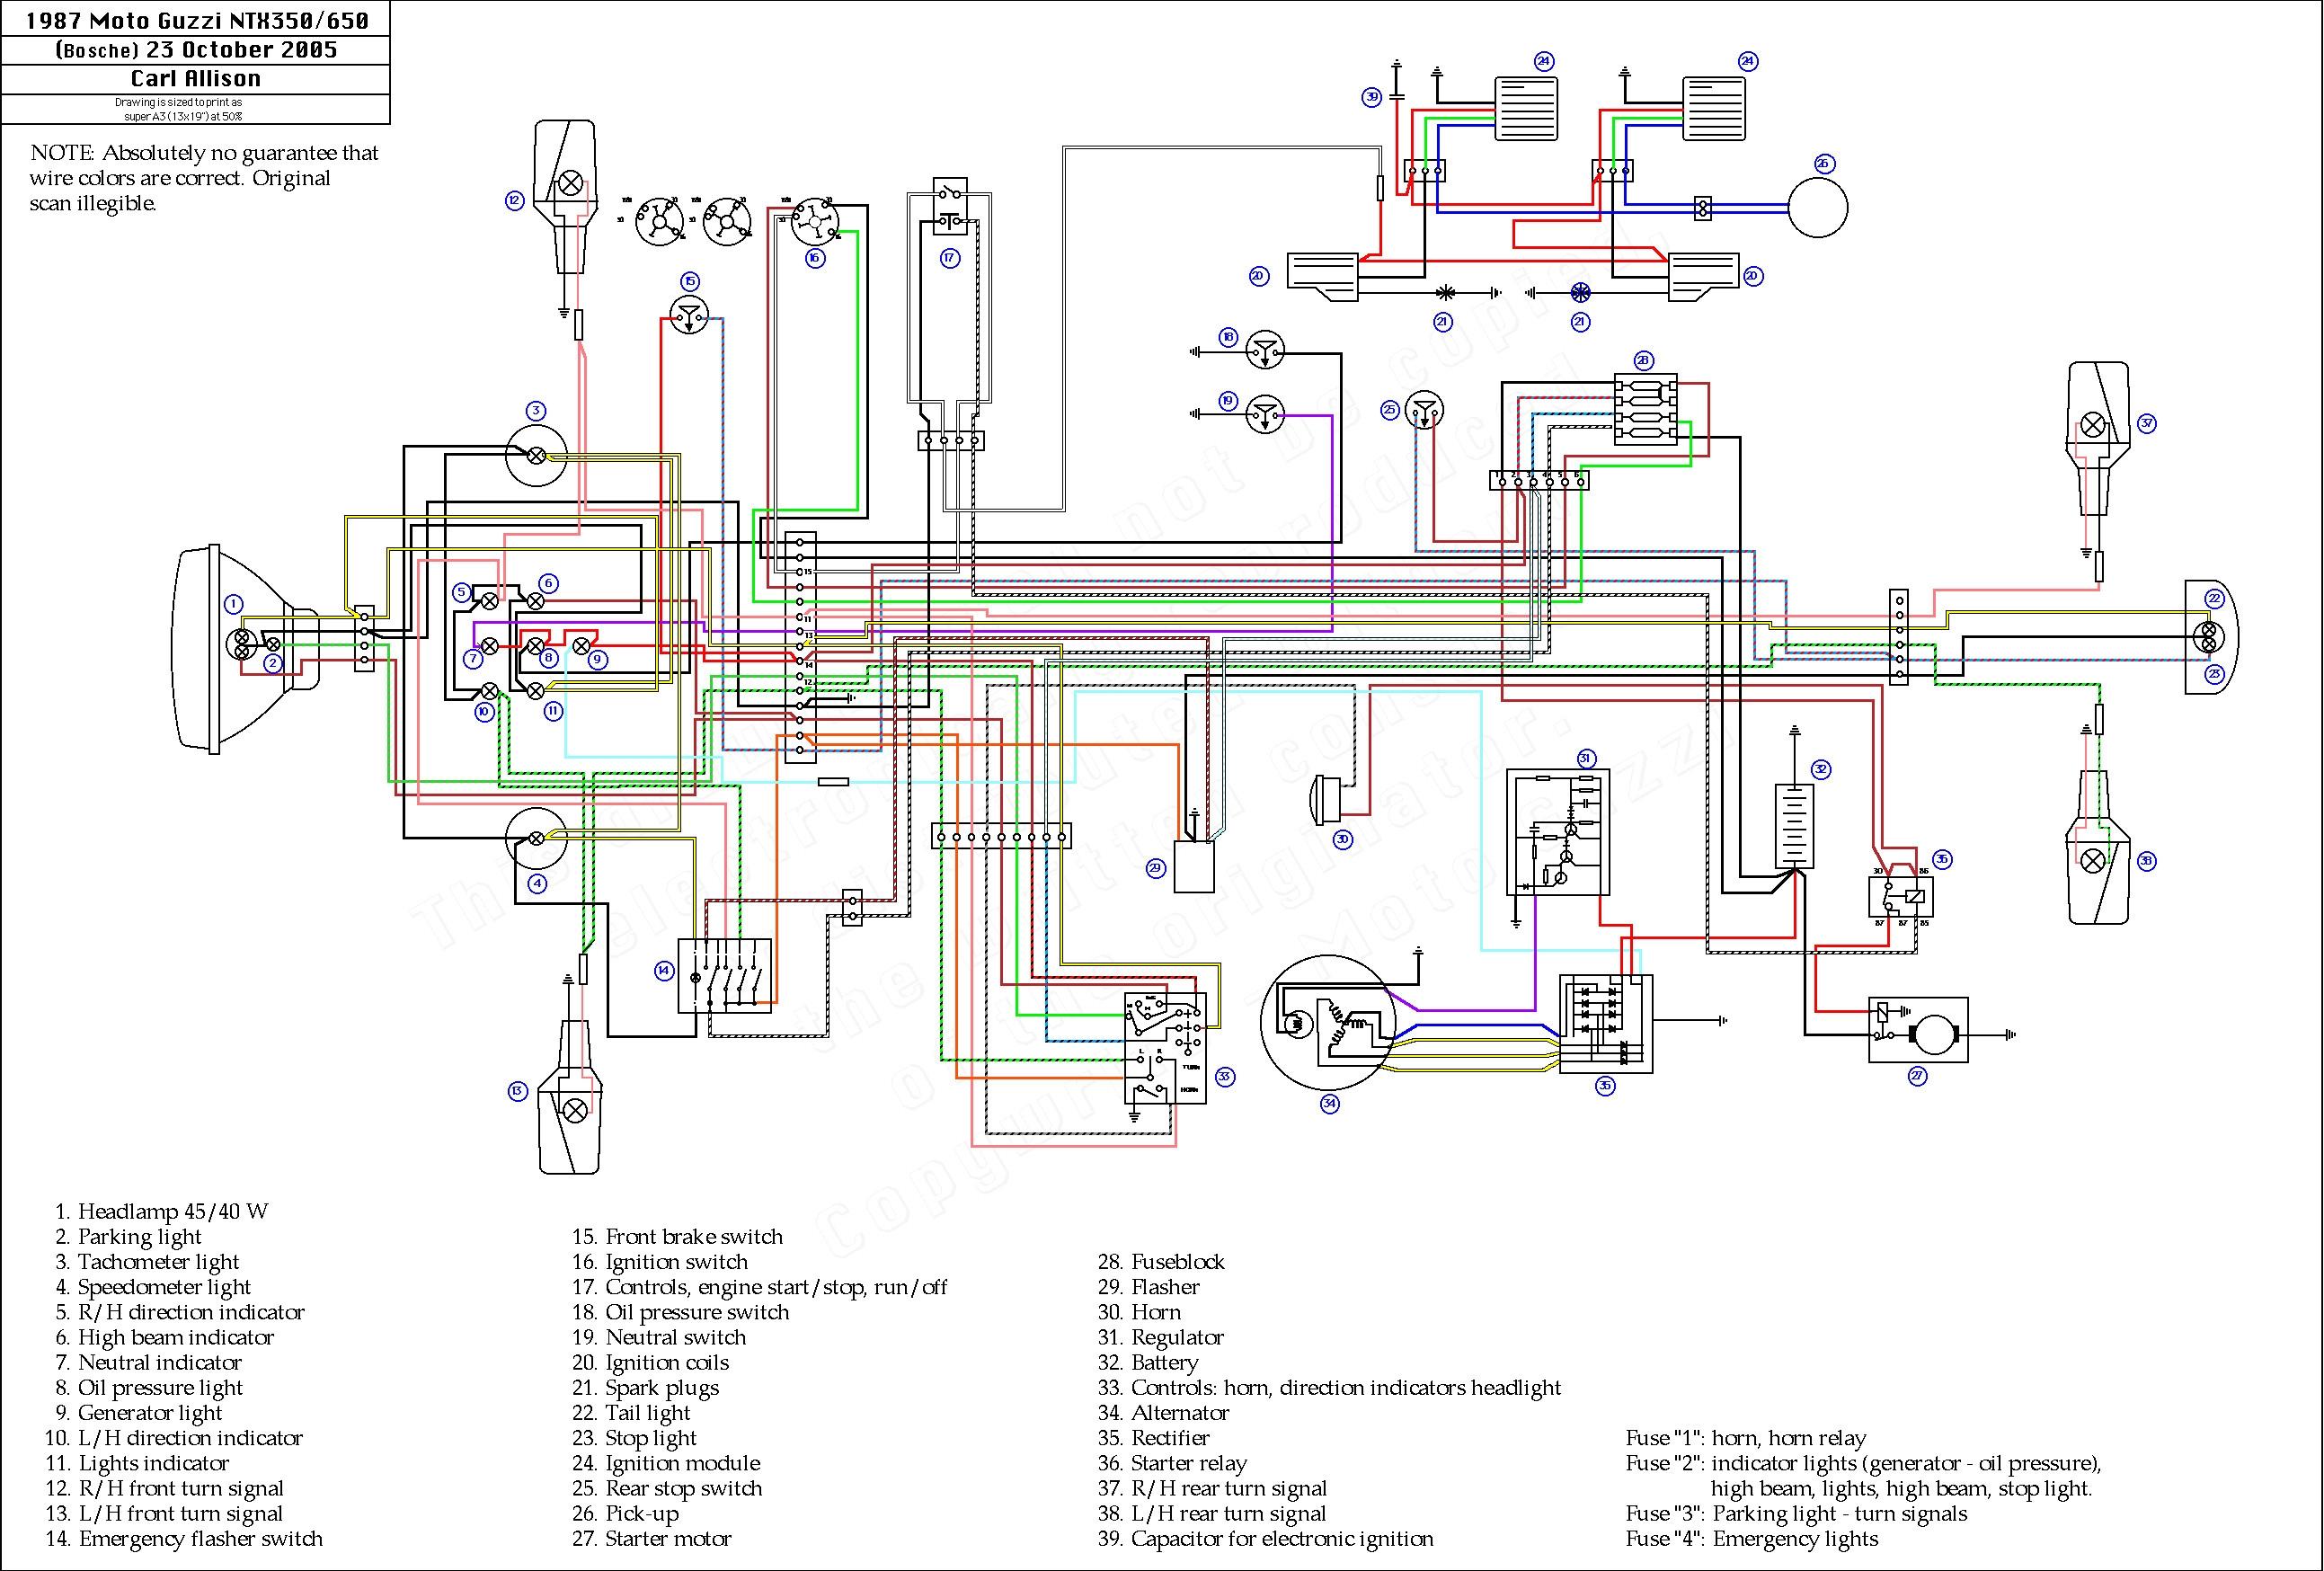 yamaha warrior 350 wiring diagram 4 wheeler | wiring diagram data scatter  comitato pendolari orte